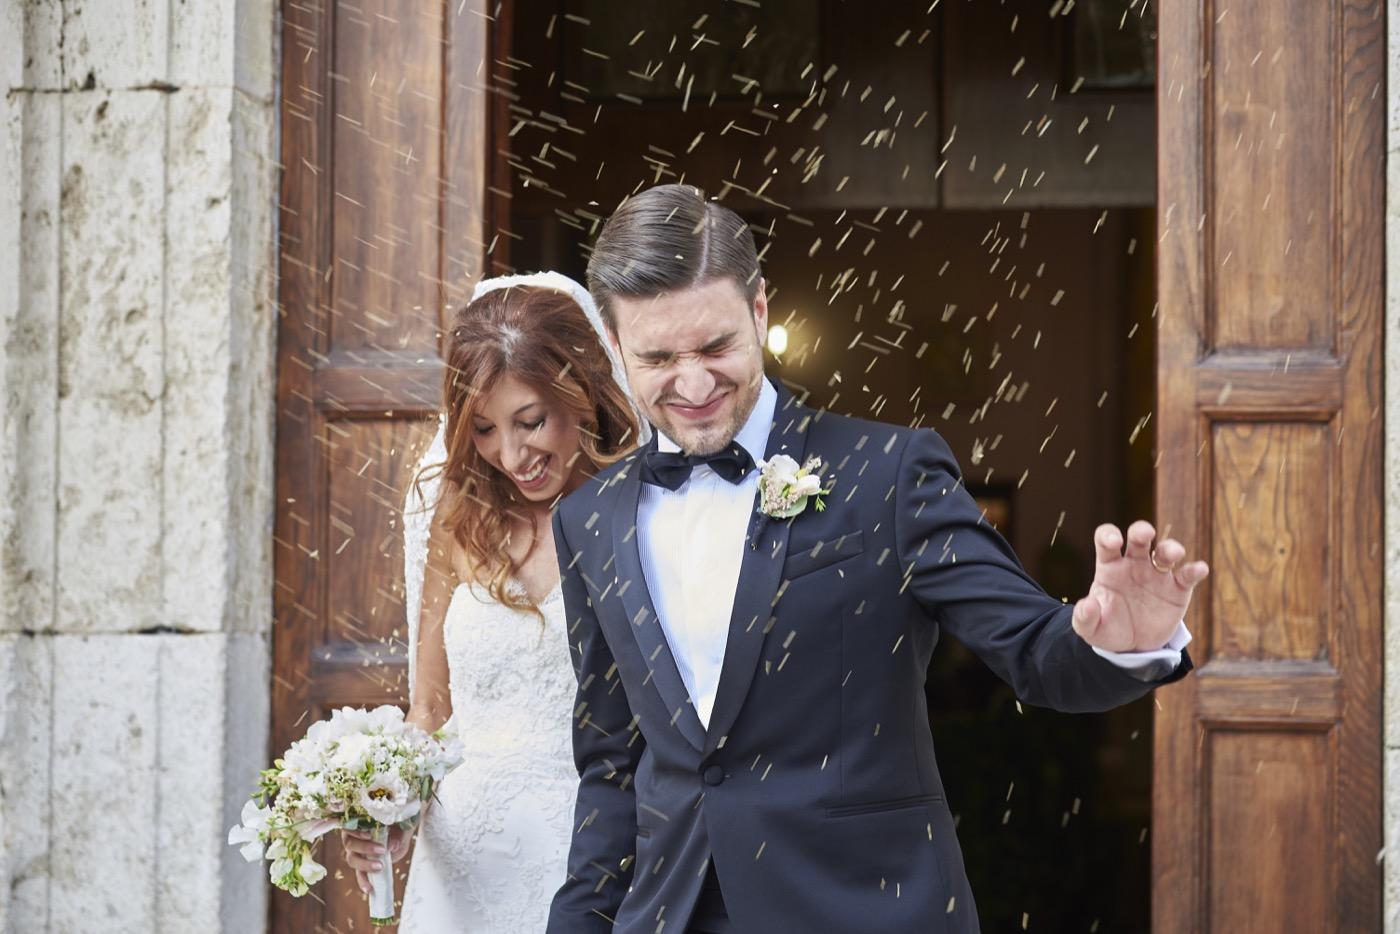 Claudio-Coppola-wedding-photographer-abbazia-7-frati-piegaro-59